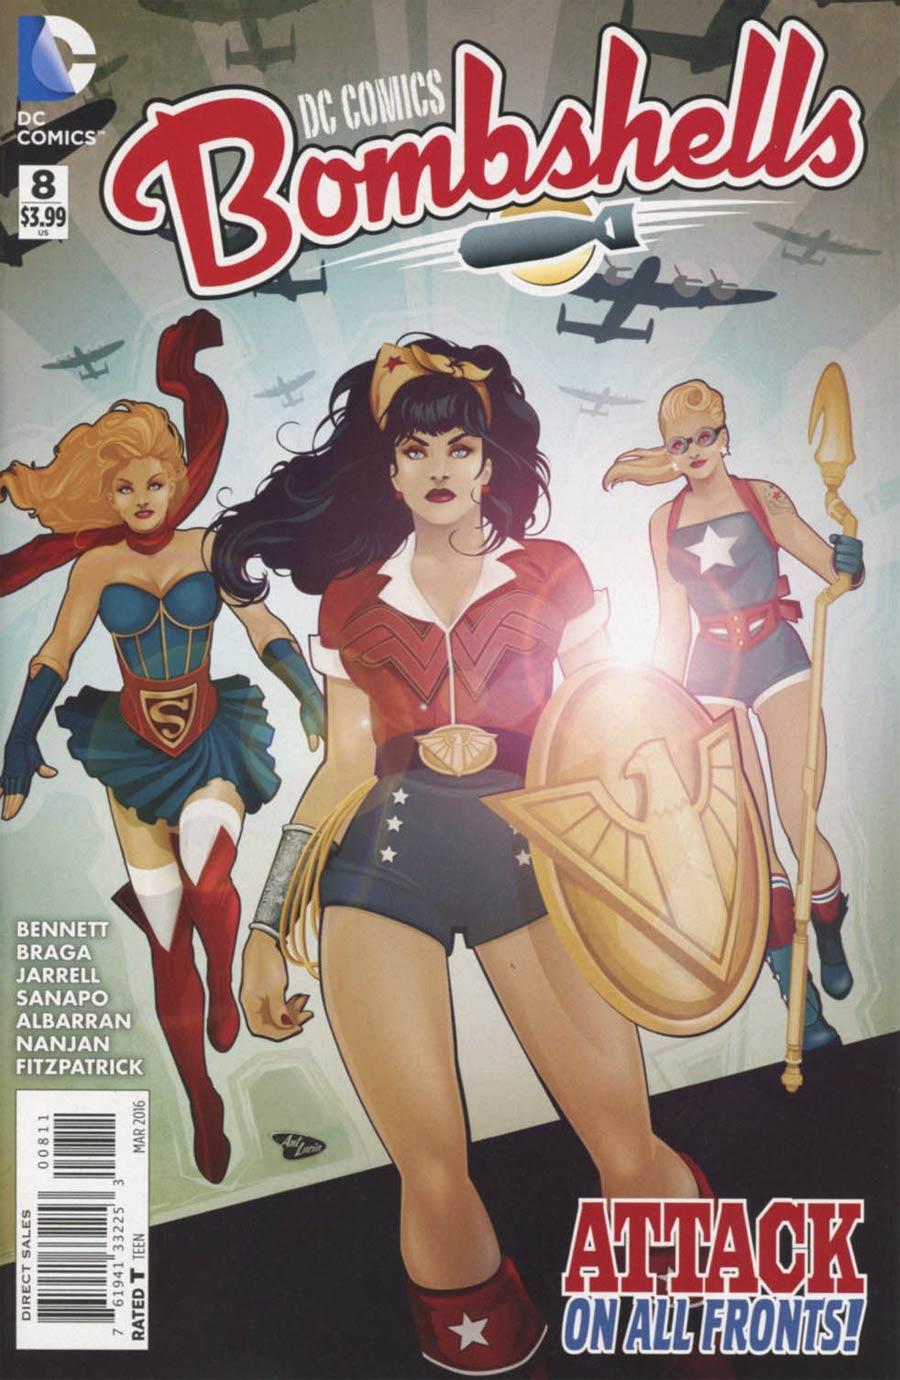 DC Comics Bombshells #8